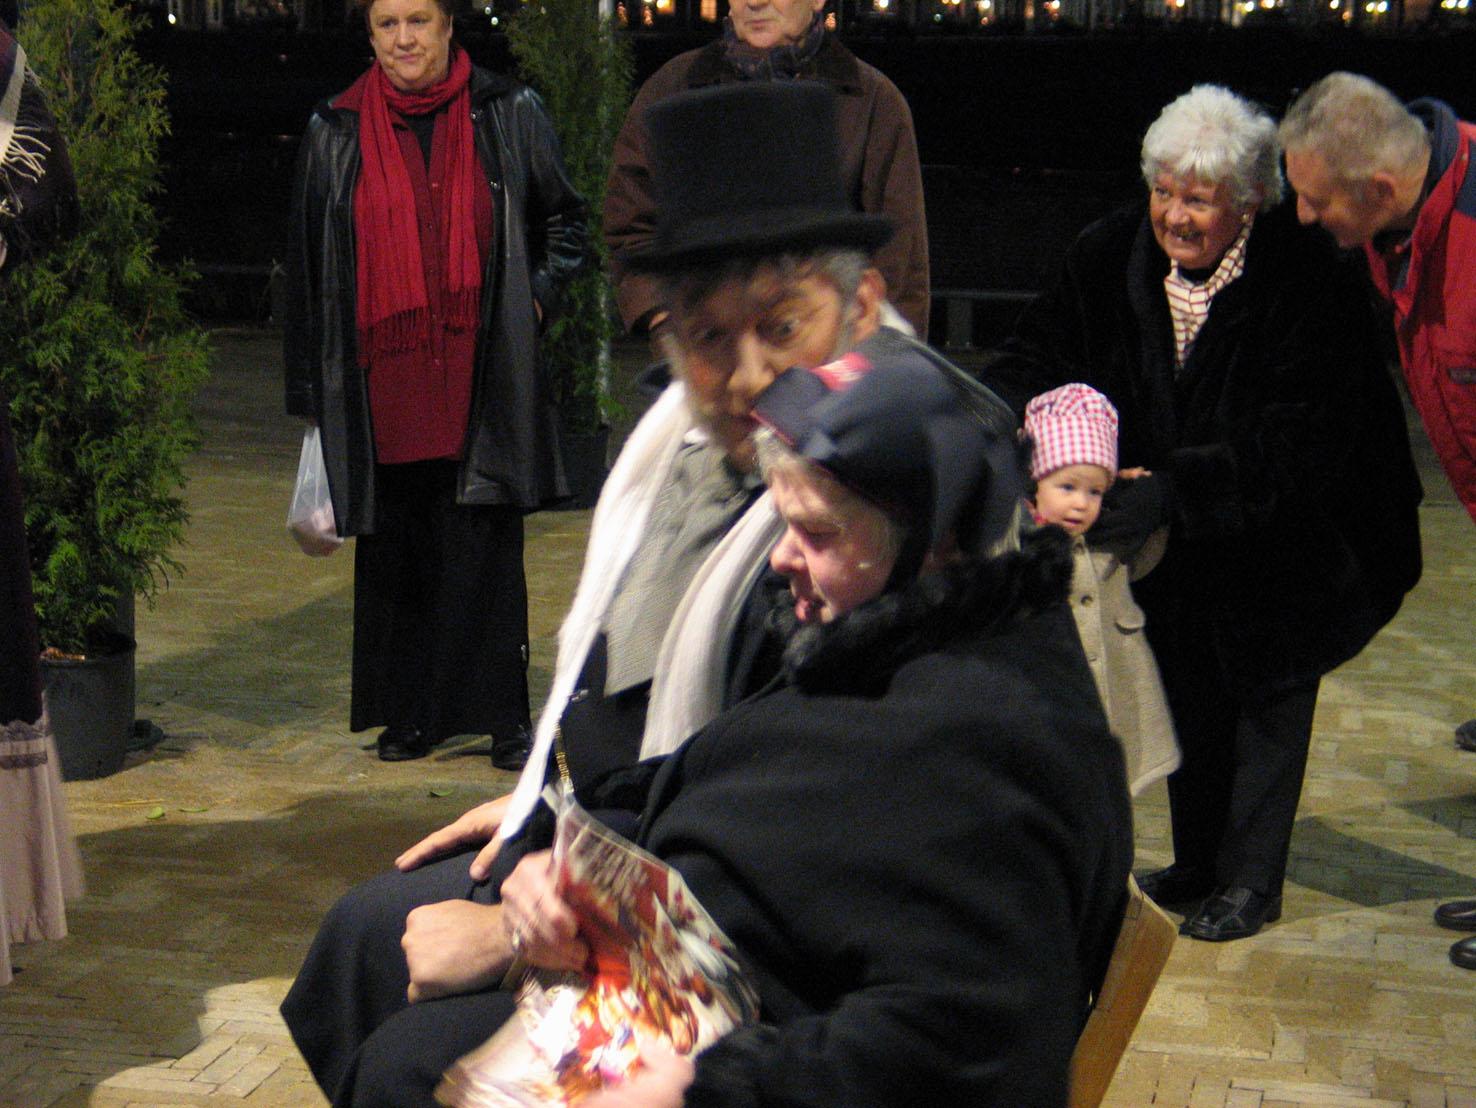 159 - Kerstmarkt Helmond 2003.jpg